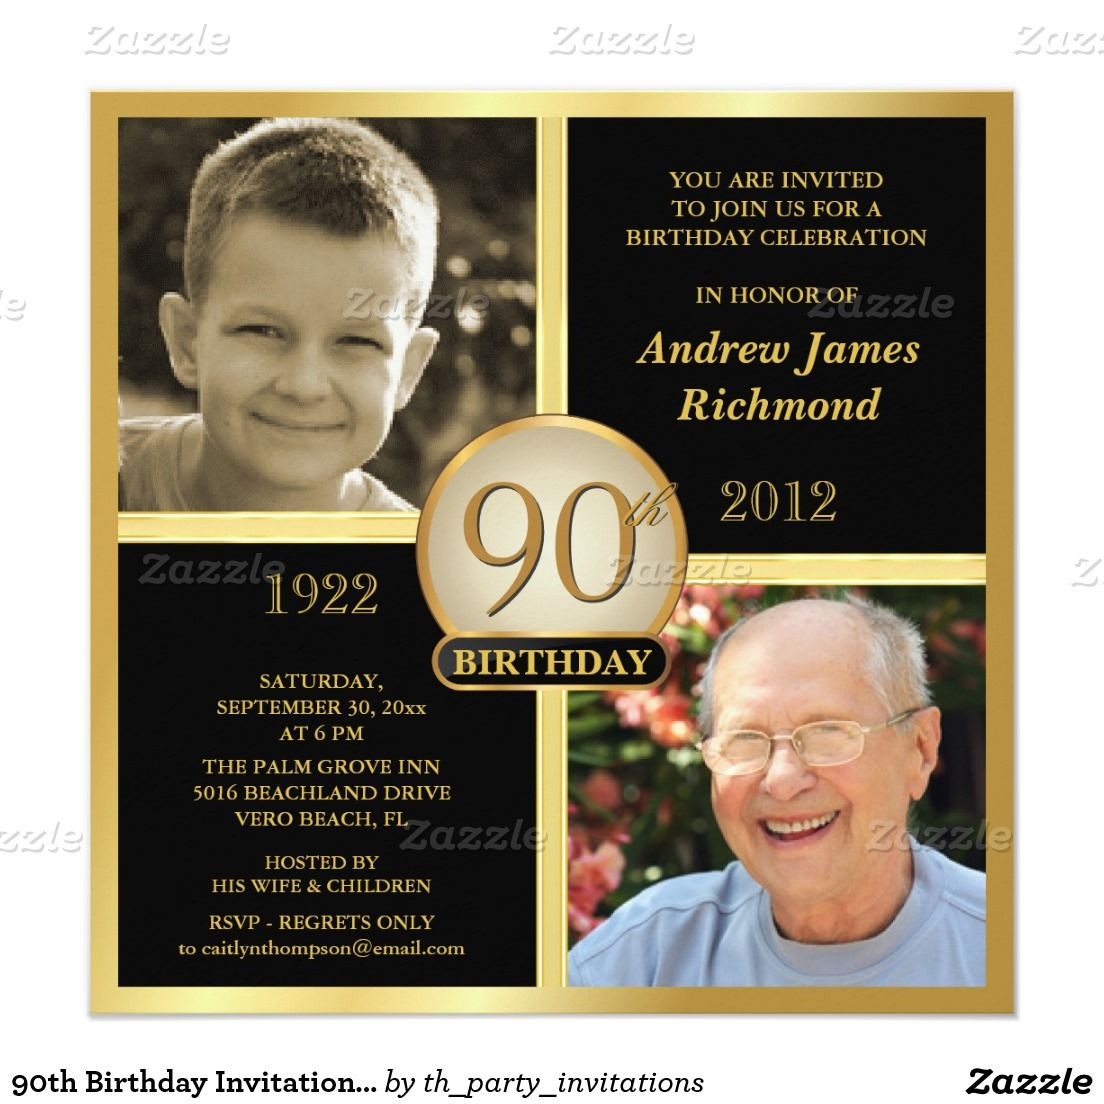 90th Birthday Invitations Then Now 2 Photos